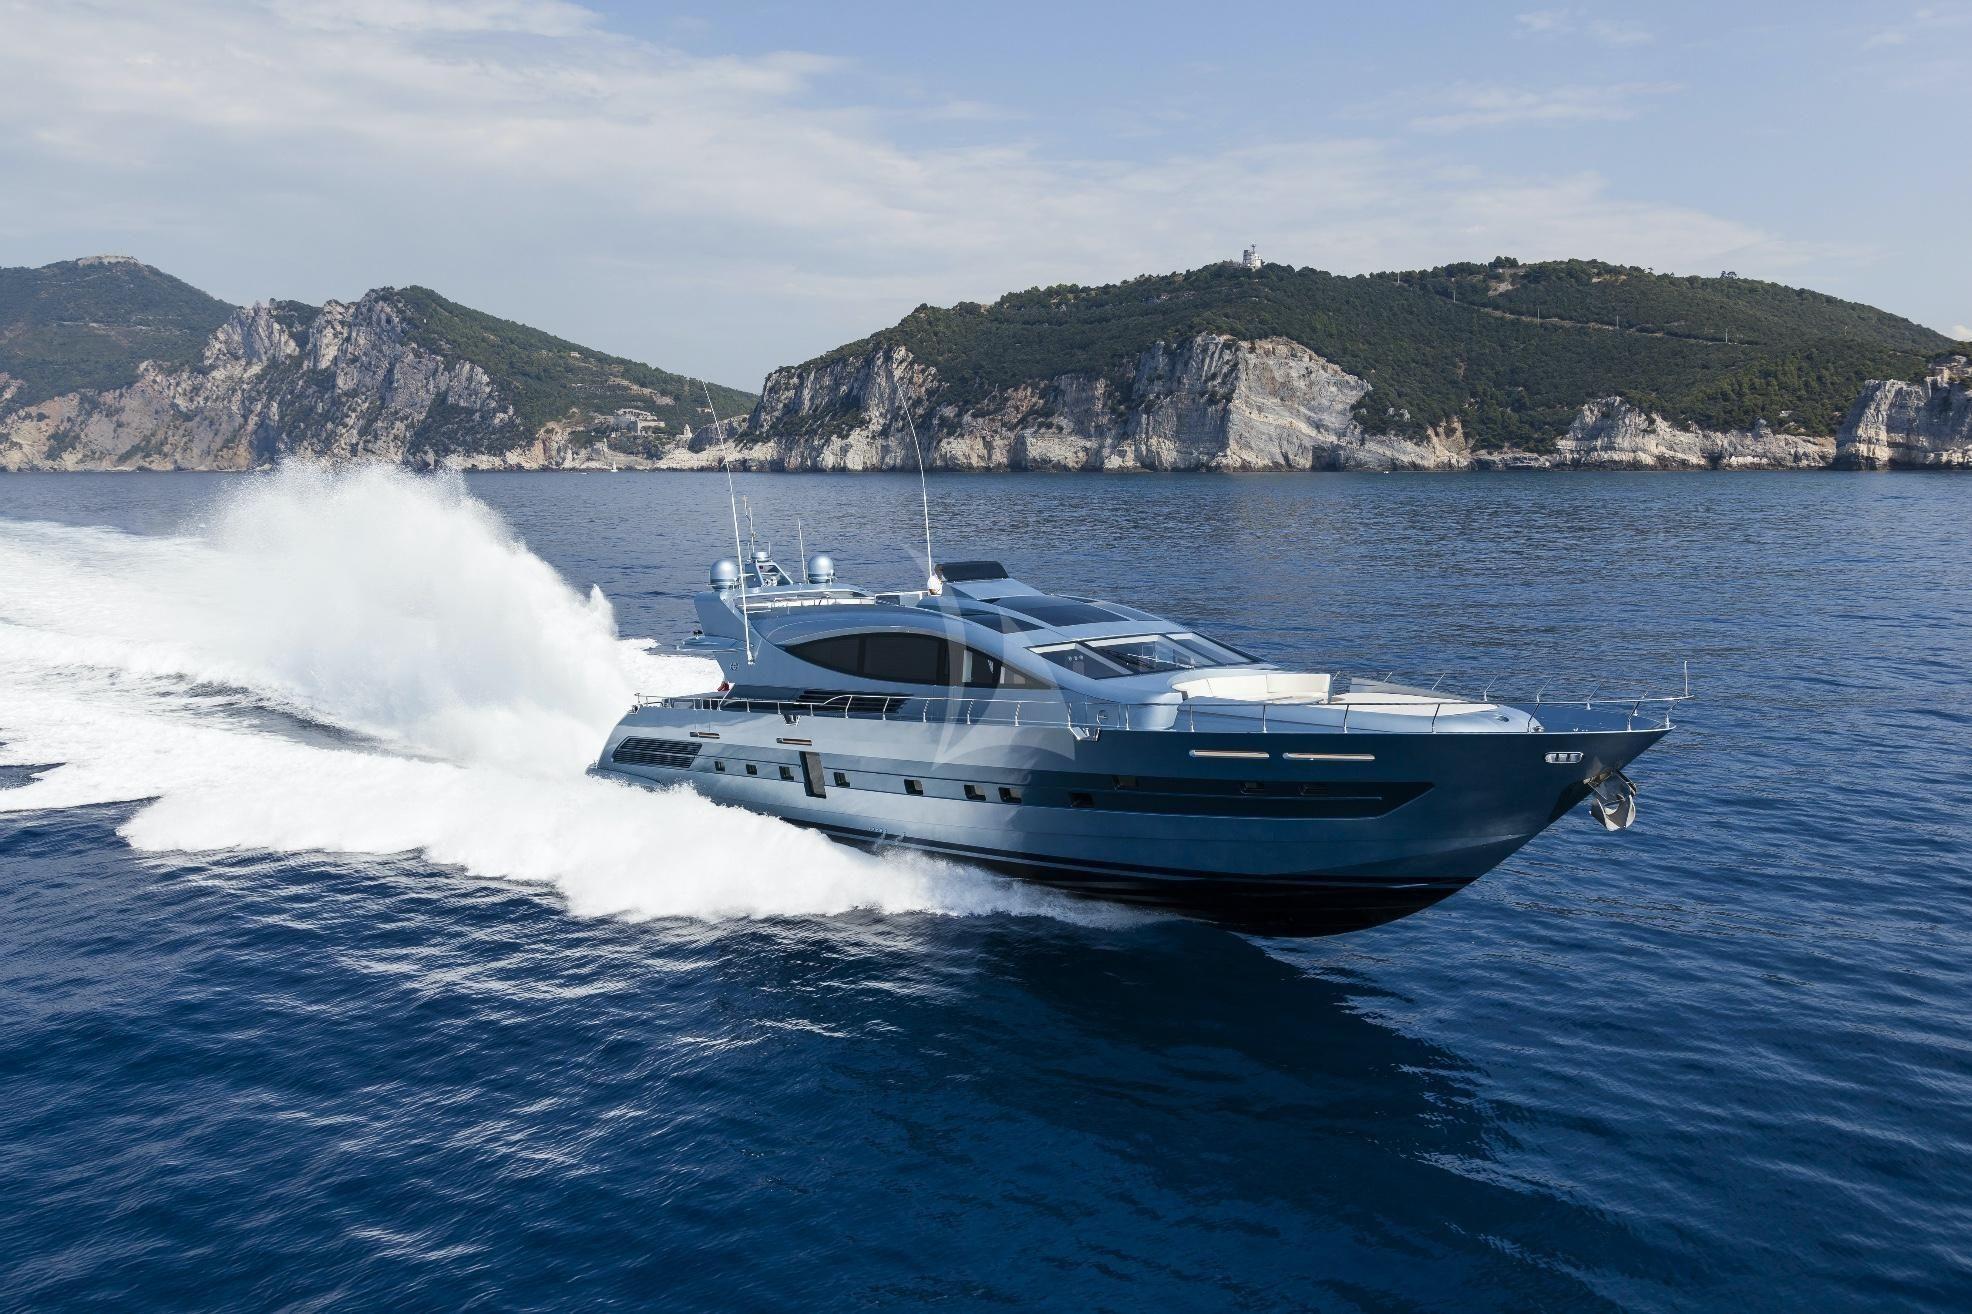 55 FIFTYFIVE - Cerri Flying Sport 102 - 5 Cabins - Amalfi Coast - Naples - Capri